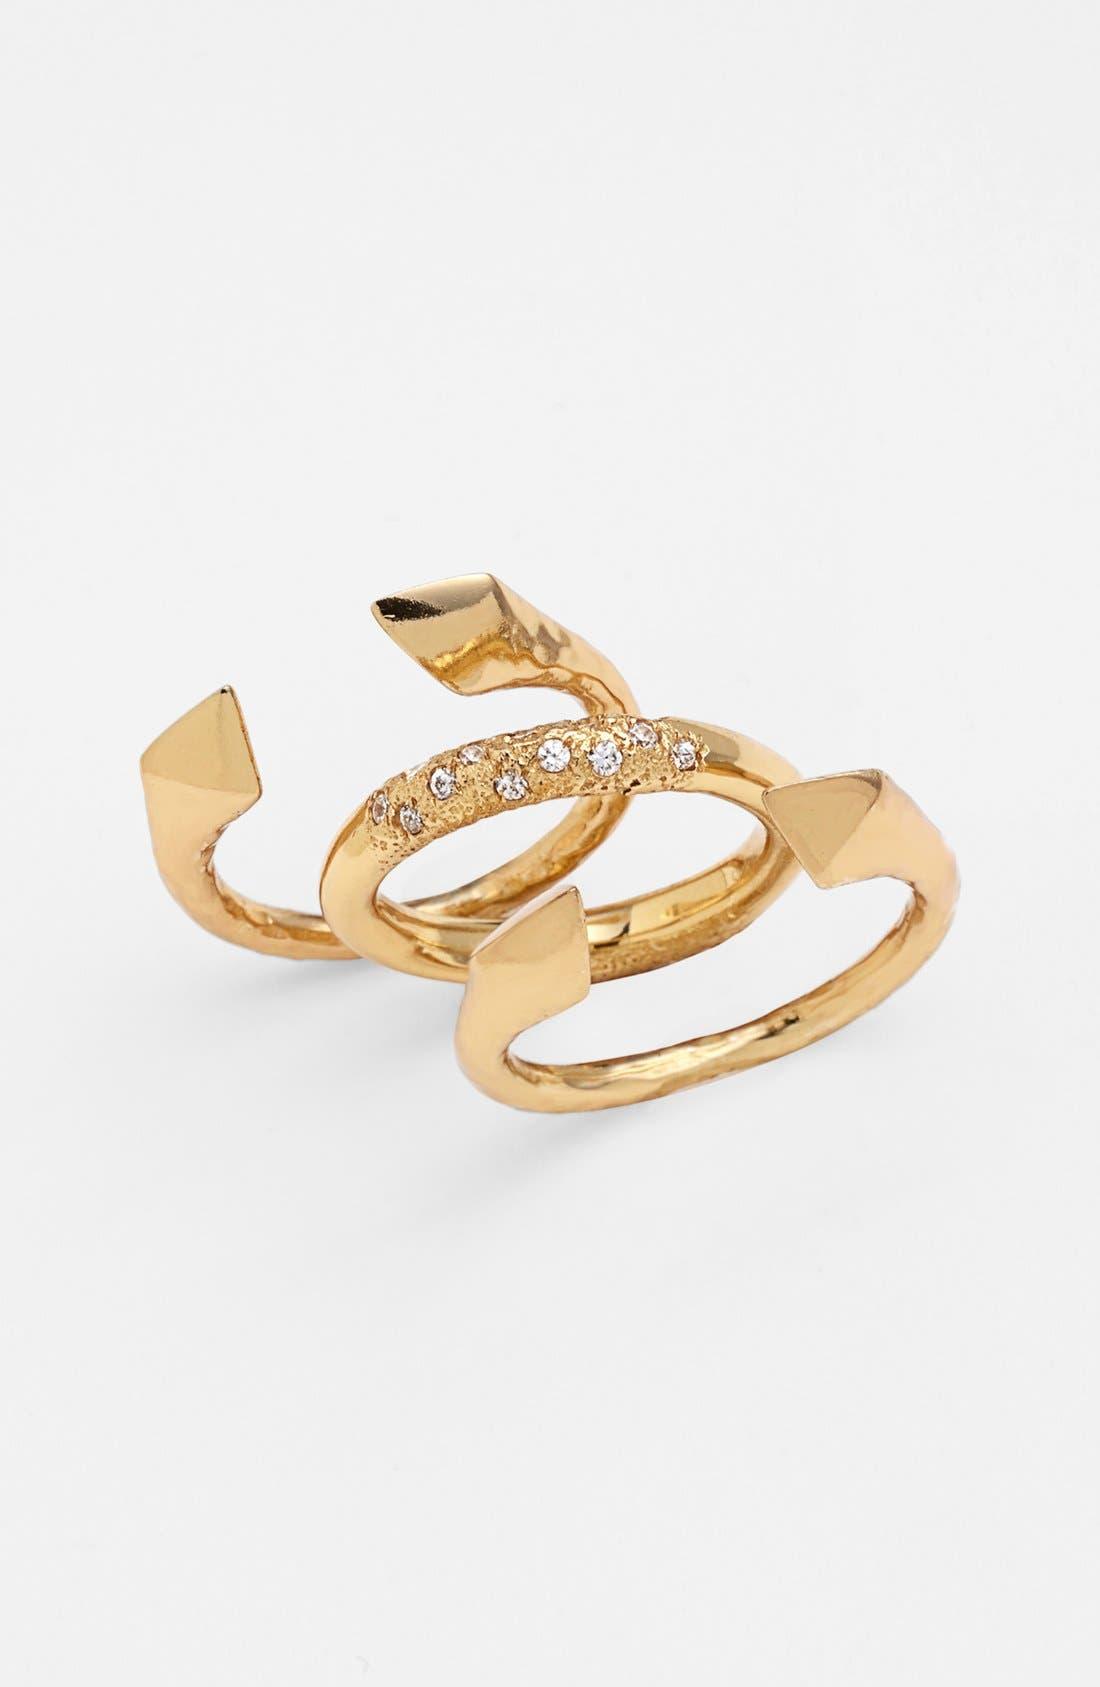 Main Image - Melinda Maria 'Nailhead - Harris' Stackable Rings (Set of 3) (Nordstrom Exclusive)